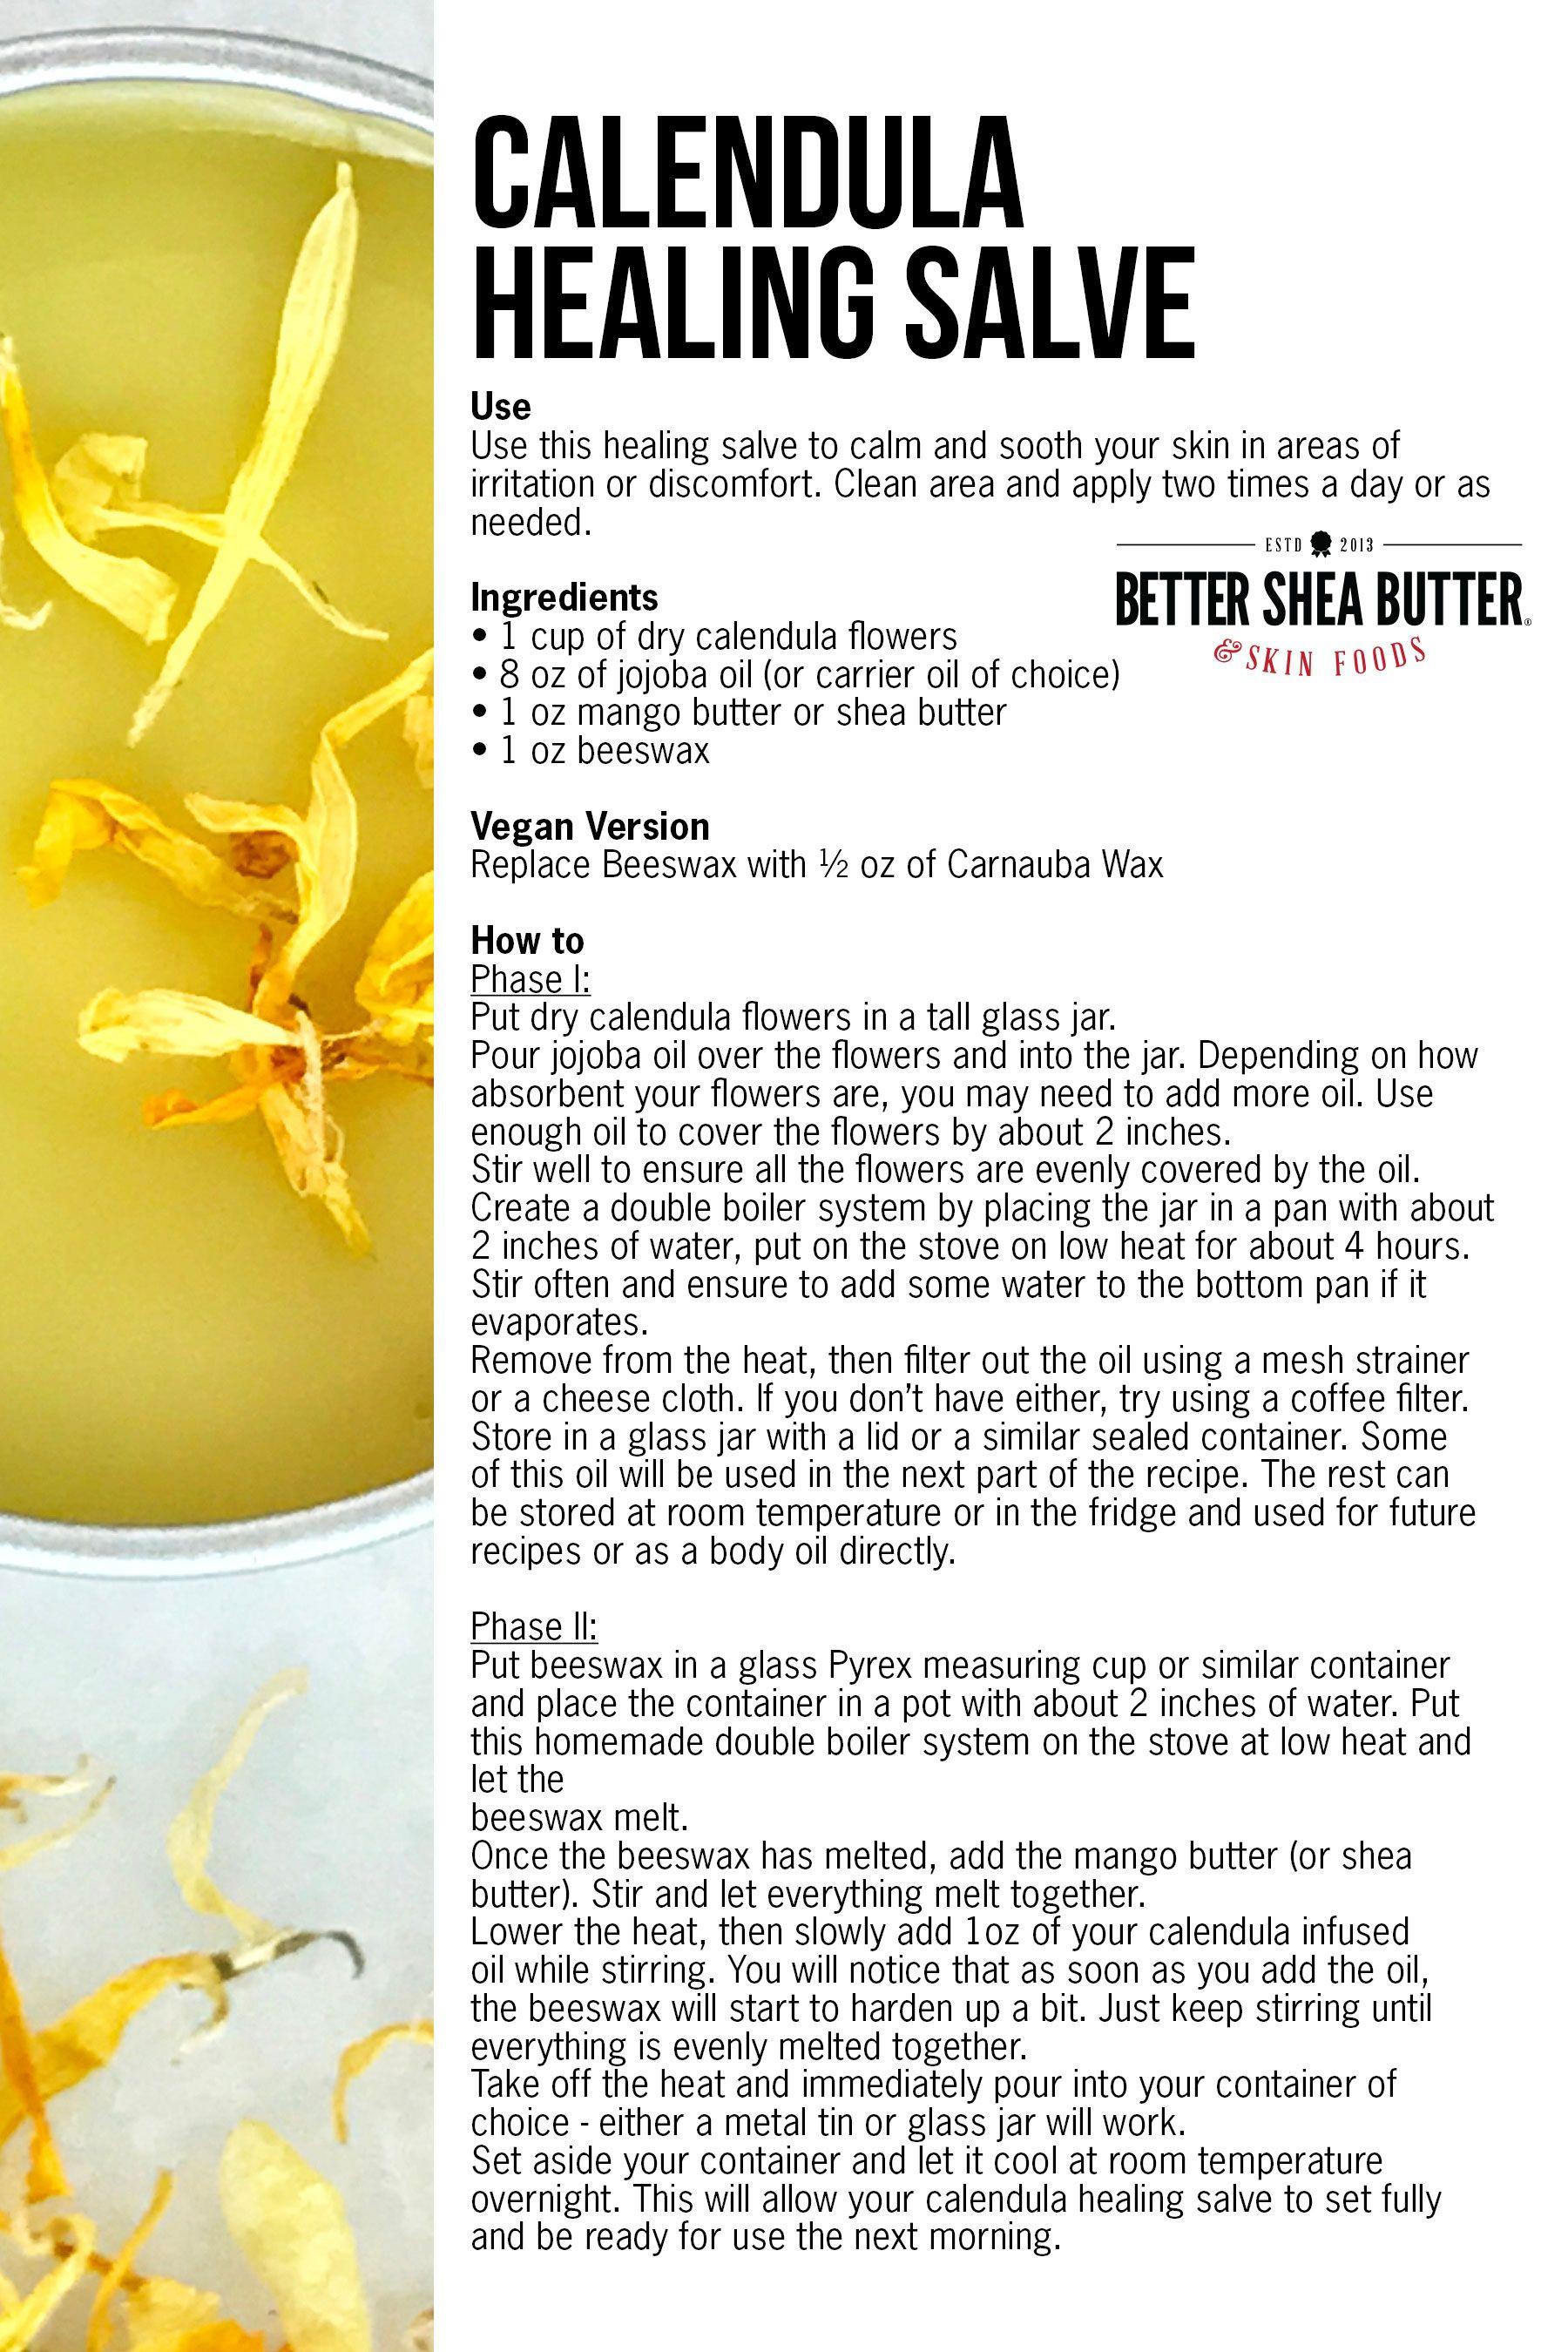 Homemade Calendula Healing Salve w/ Mango or Shea